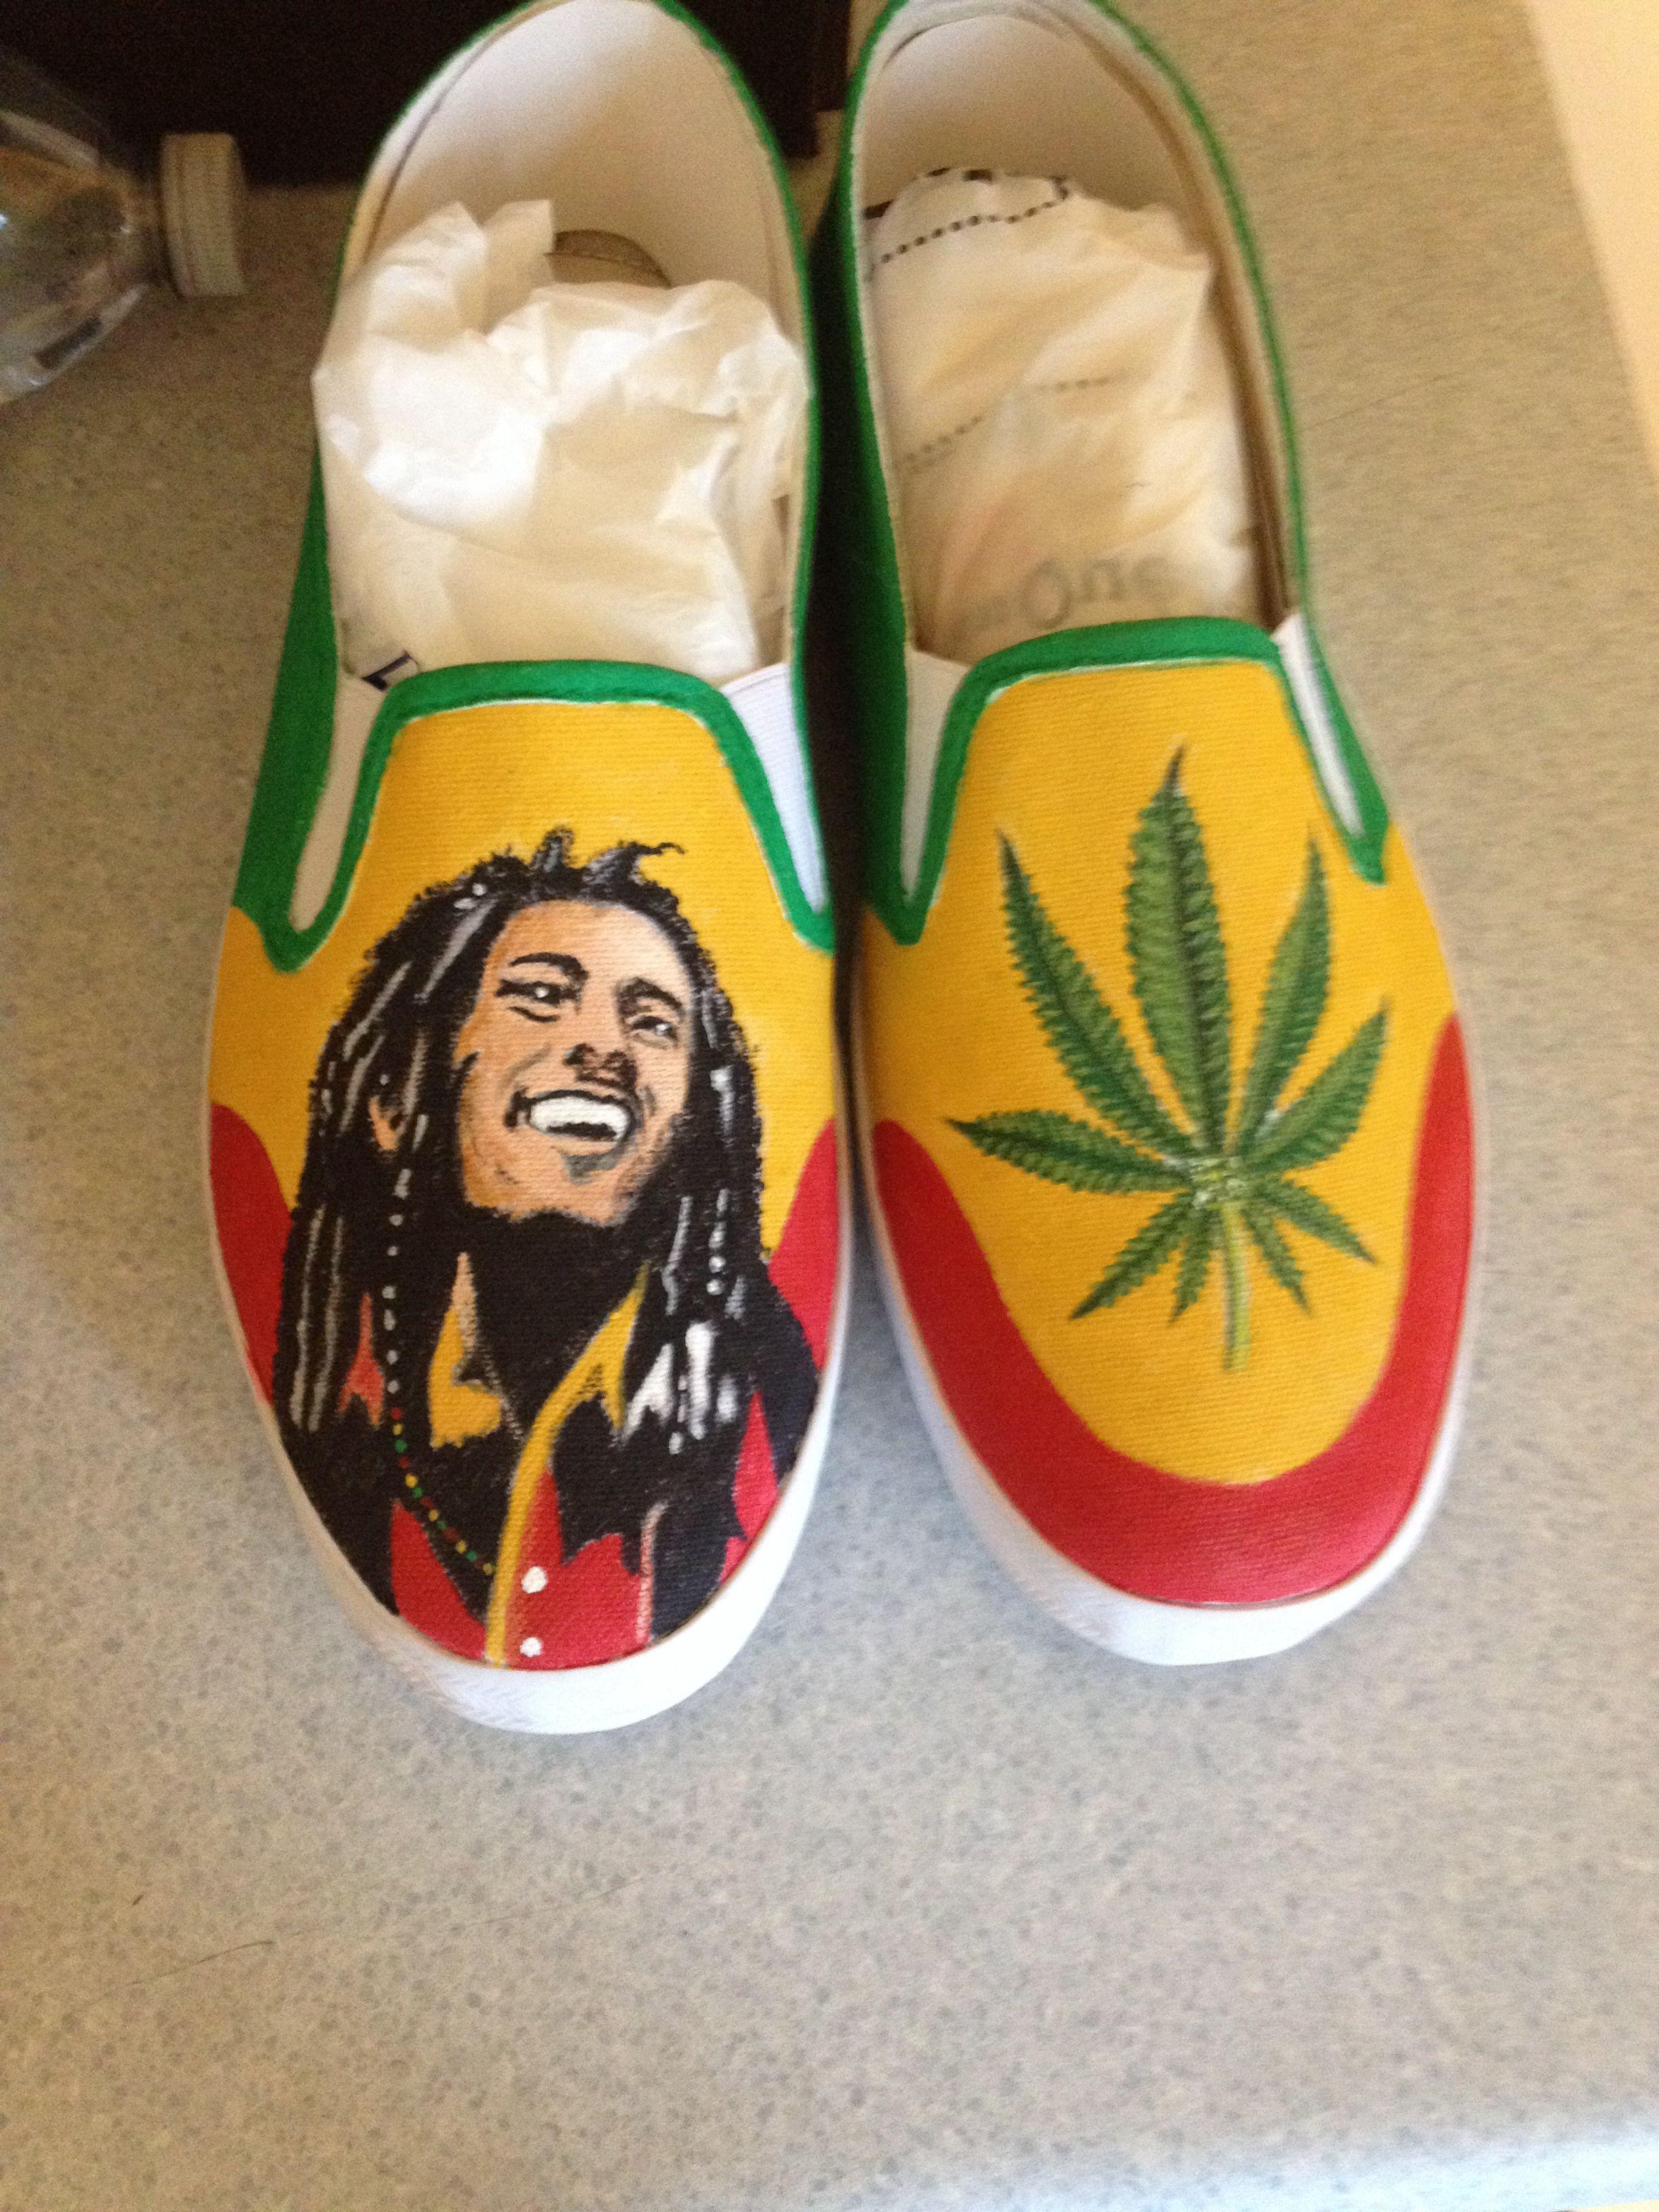 Bob Marley custom painted shoes